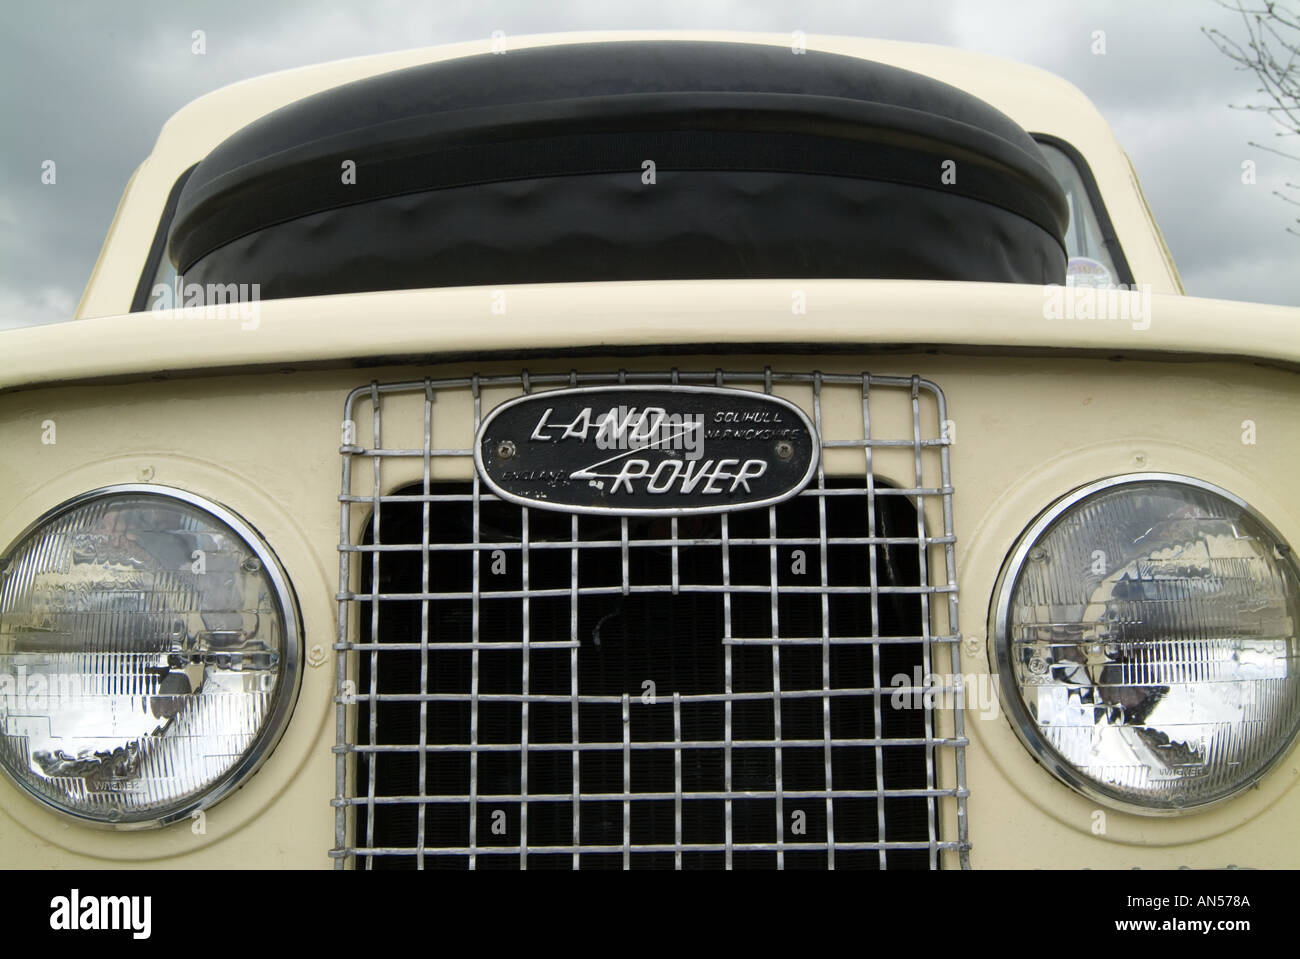 https://c8.alamy.com/comp/AN578A/classic-land-rover-ambulance-car-4-4-four-by-four-four-wheel-drive-AN578A.jpg